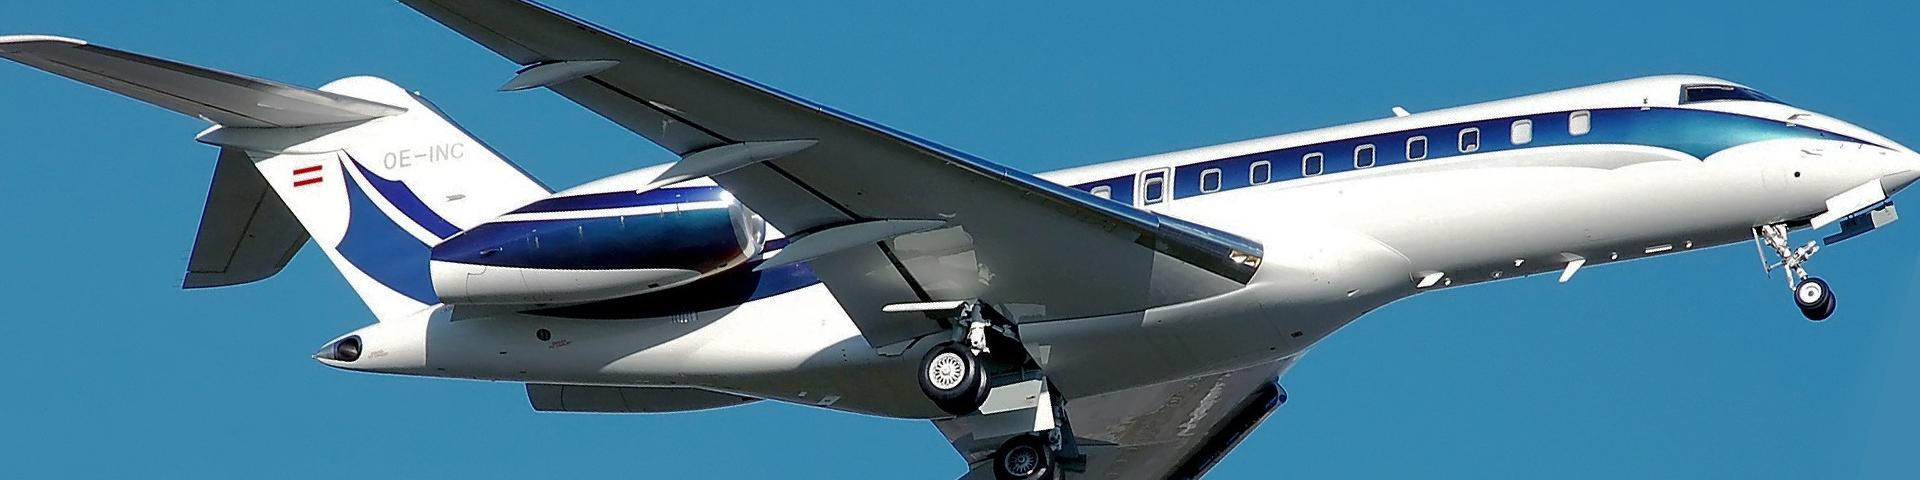 global50001 - Global 5000/6000 Private Jet